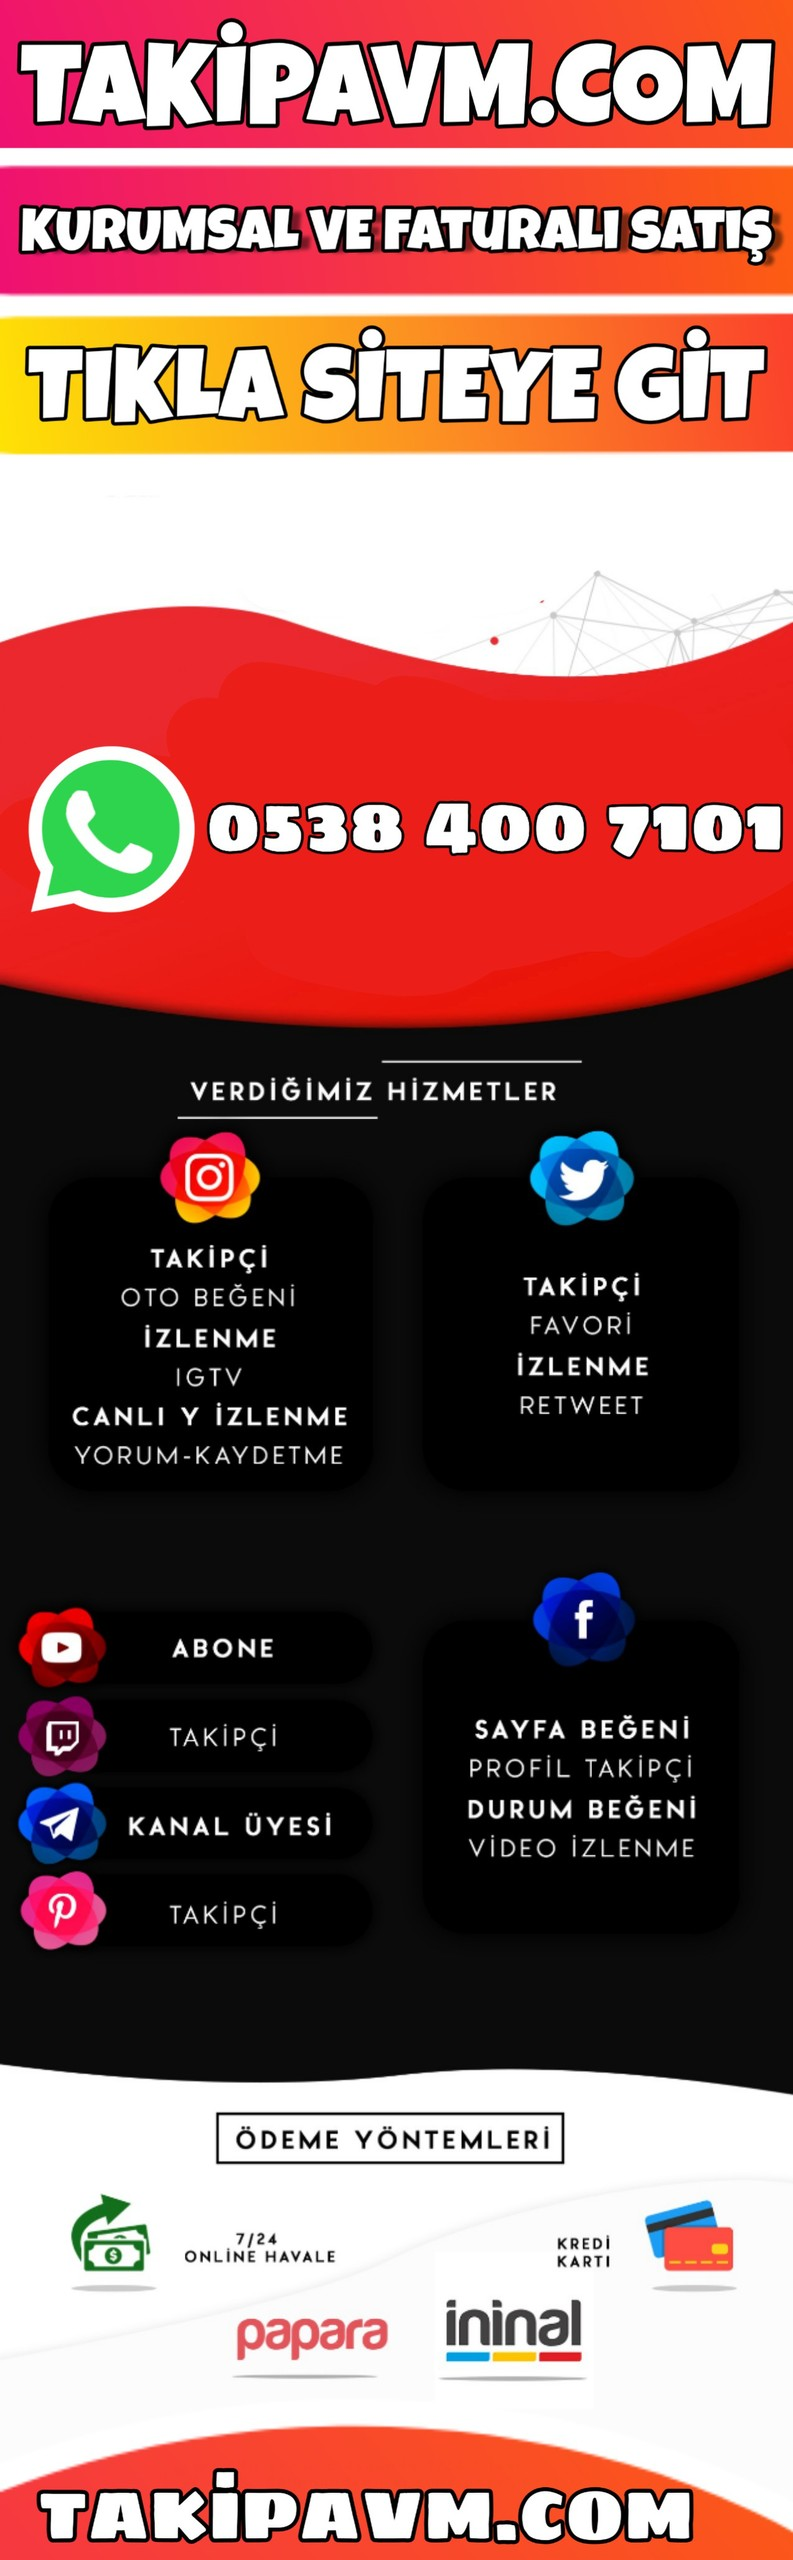 instagram takipci kasma 2020 en ucuz turk takipci satin al youtube Instagram Takipci Satin Al Youtube Abone Satin Al Wm Araci